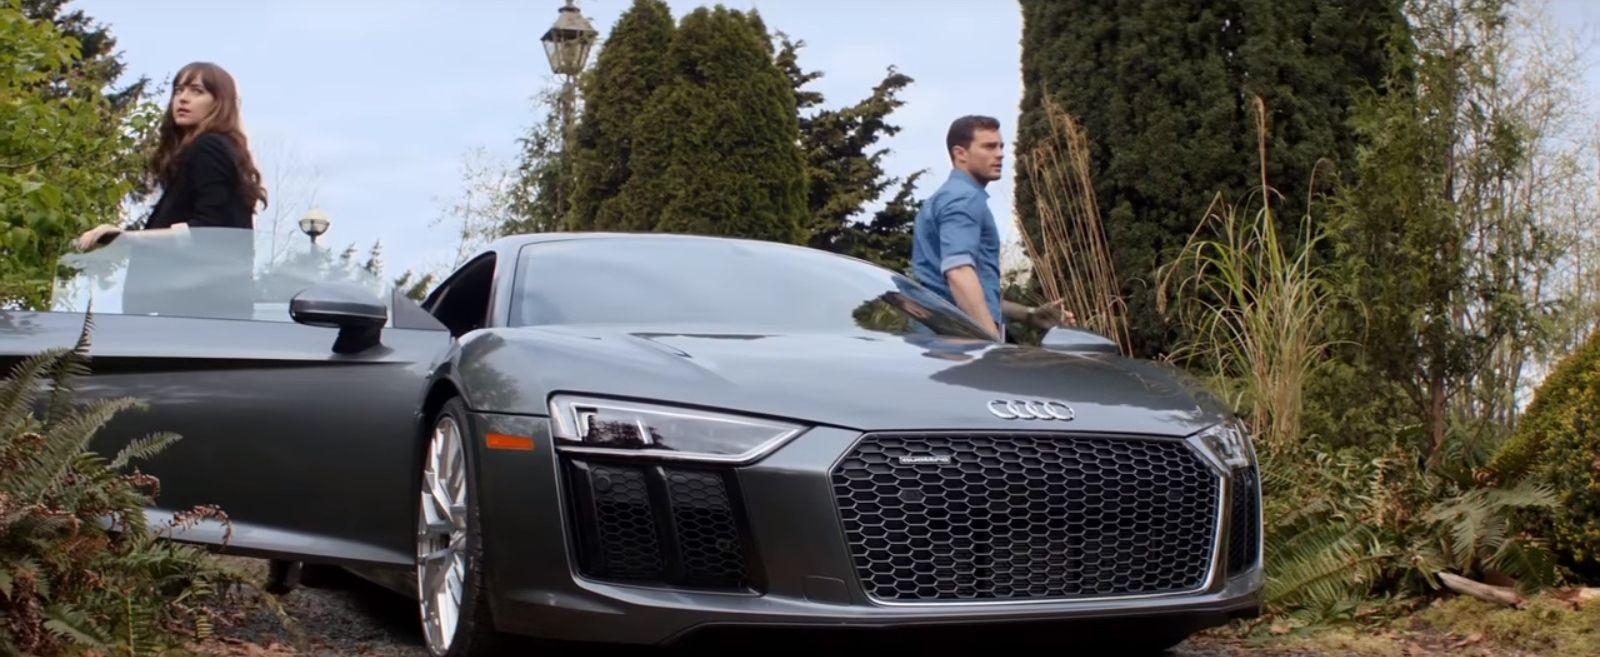 Christian Grey S Audi R8 Spyder In Fifty Shades Freed Audi R8 Spyder Fifty Shades Fifty Shades Freed